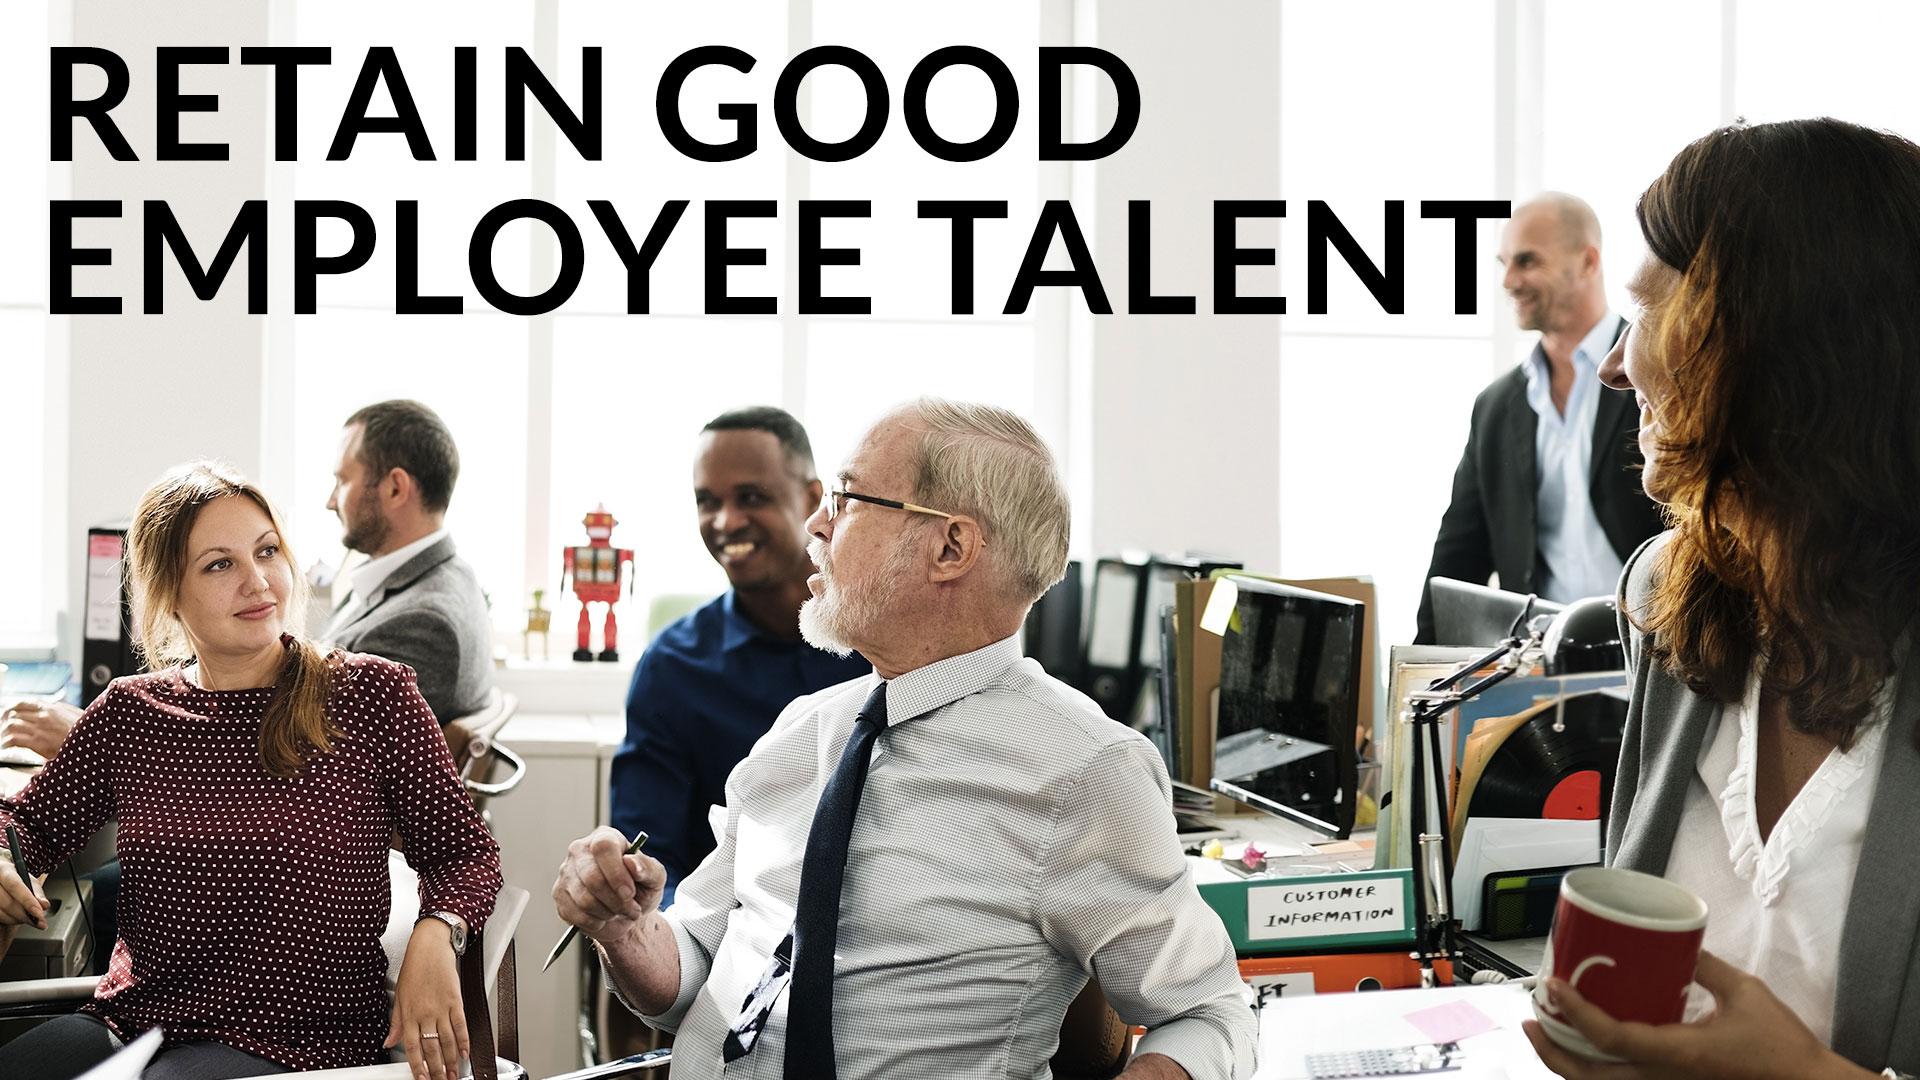 Retain-Good-Employee-Talent-1920